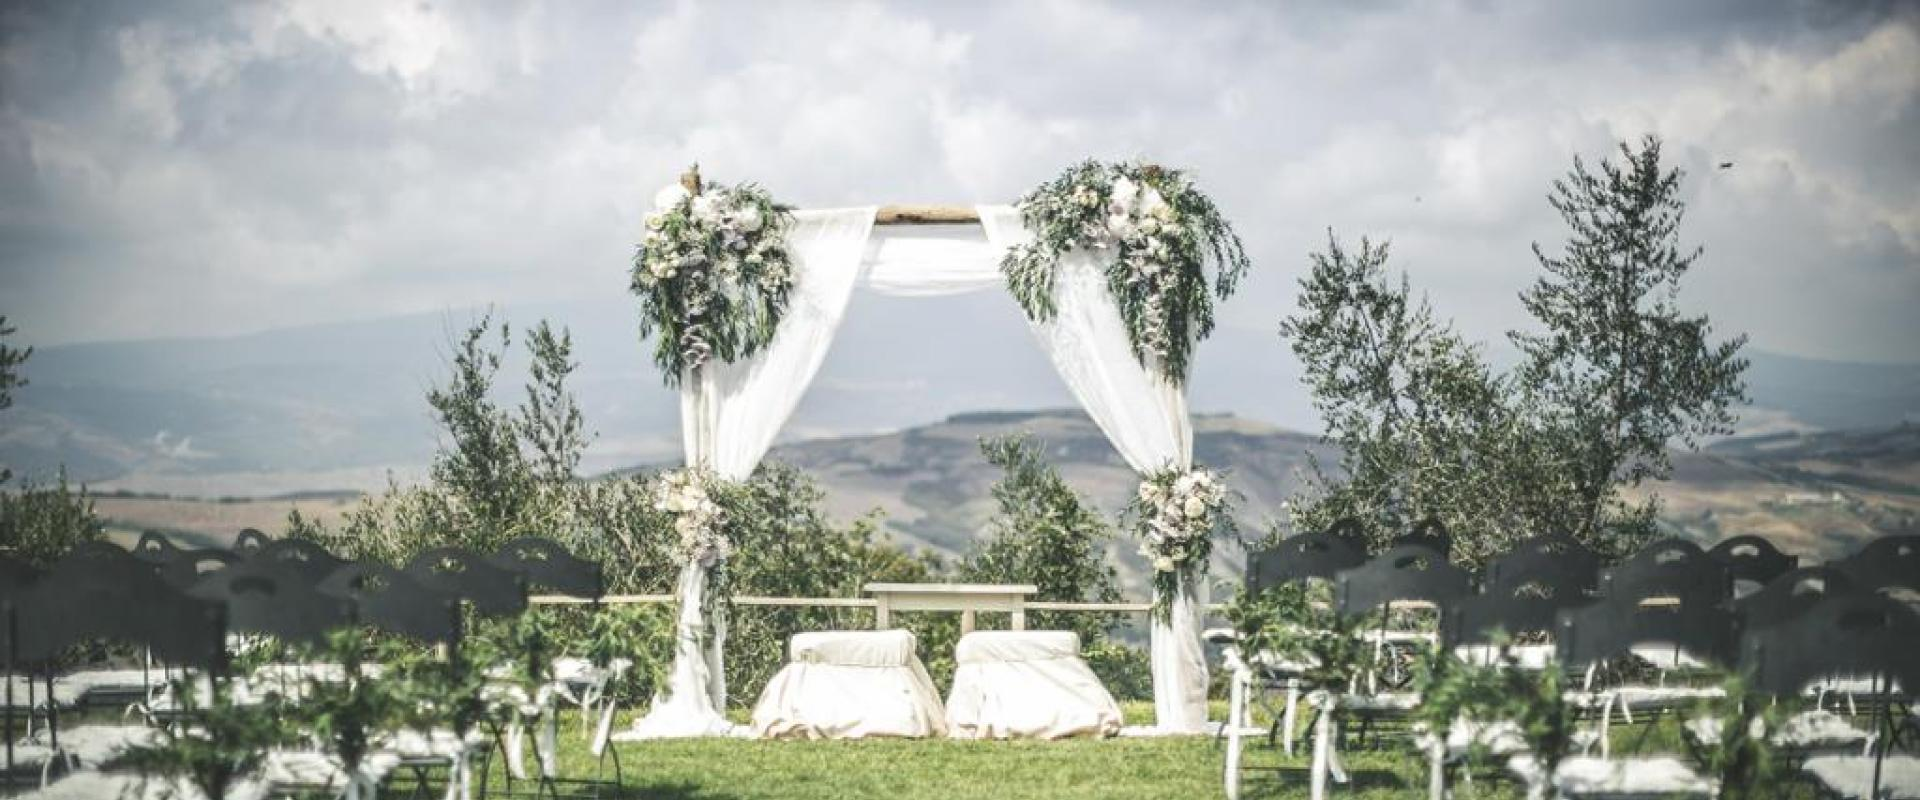 Wedding location Tuscany Siena